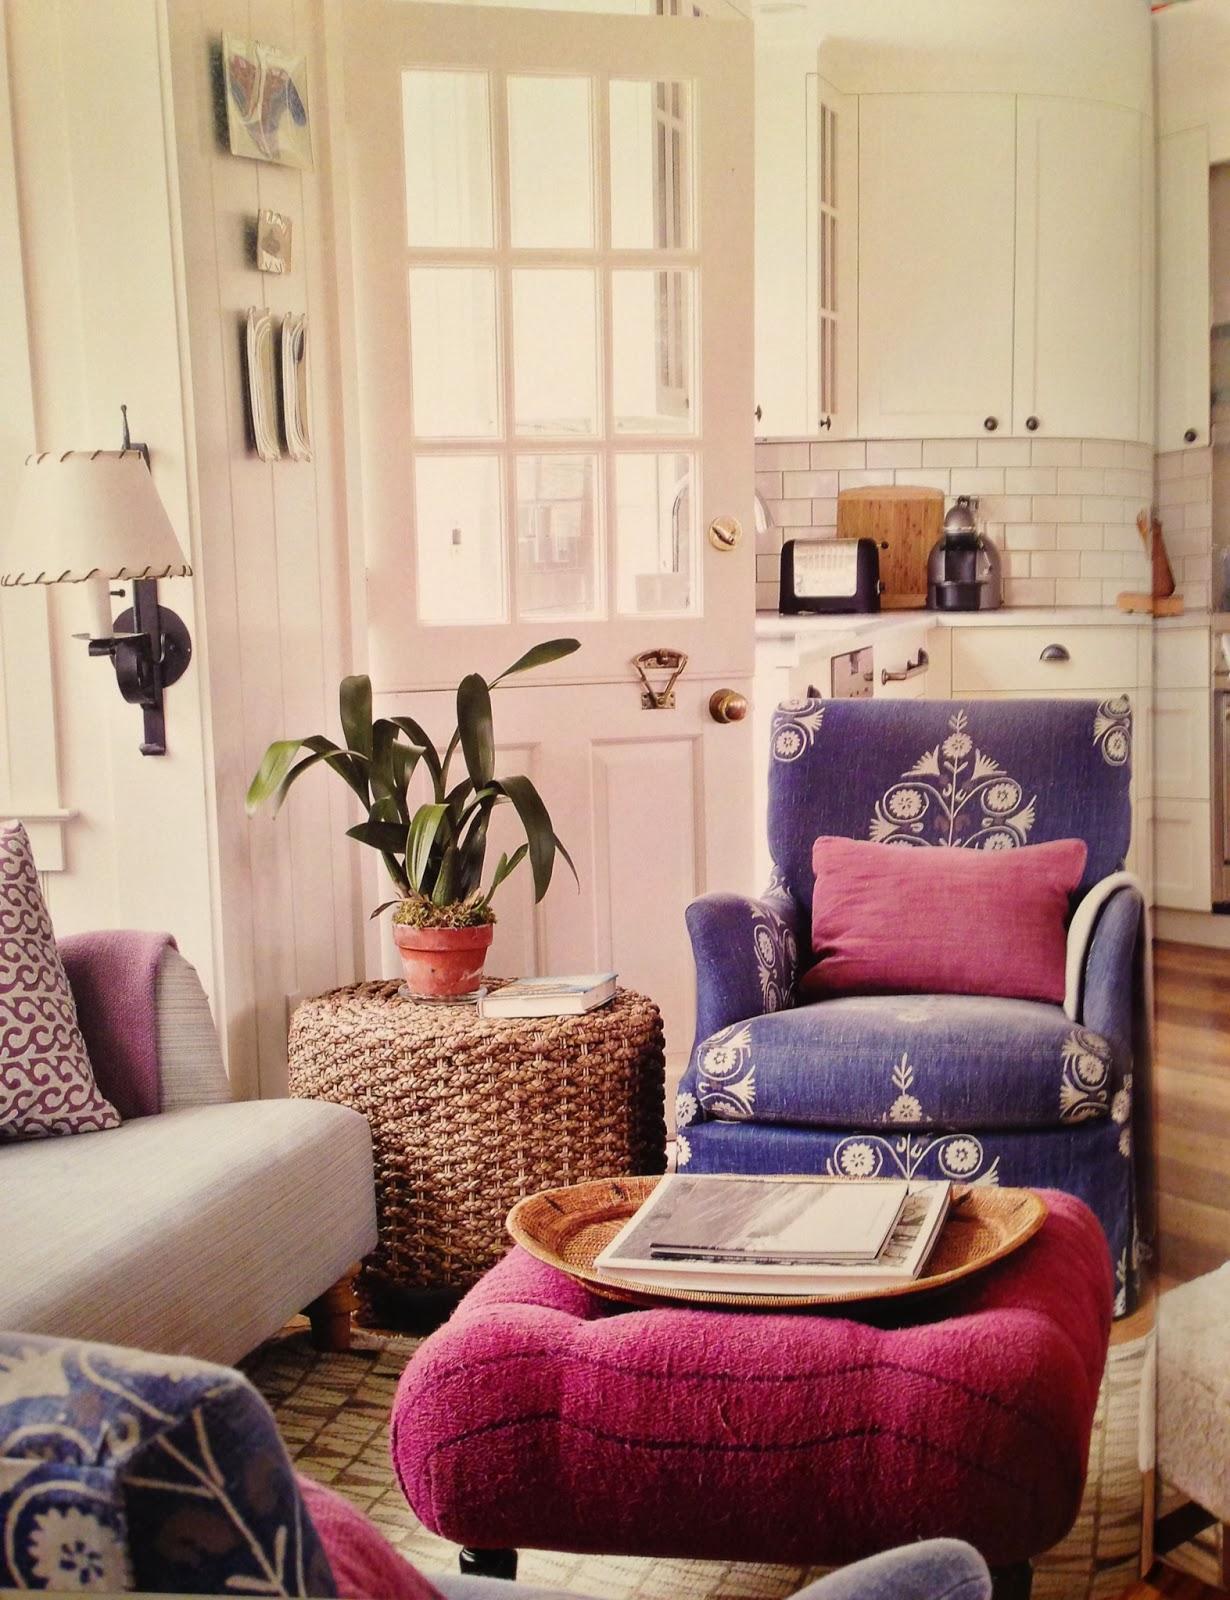 Tom Scheerer Jenny Castle Design Shelf Life Tom Scheerer Decorates